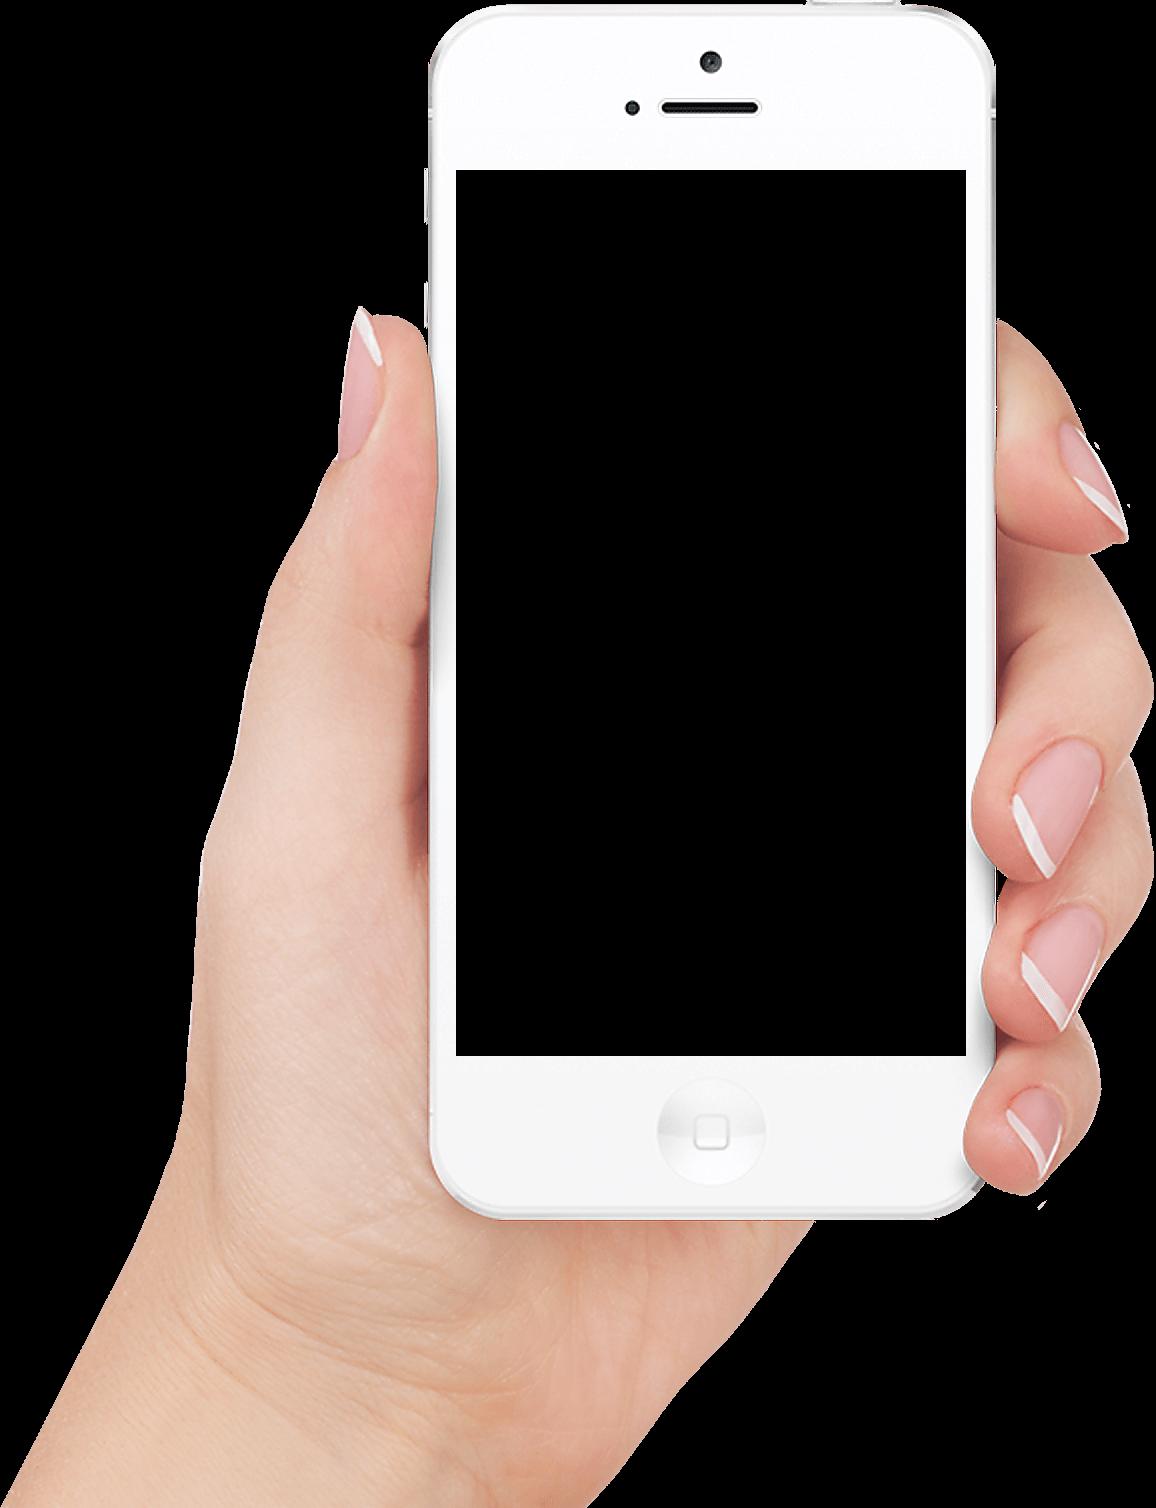 Iphone clipart iphone text. Black transparent png stickpng